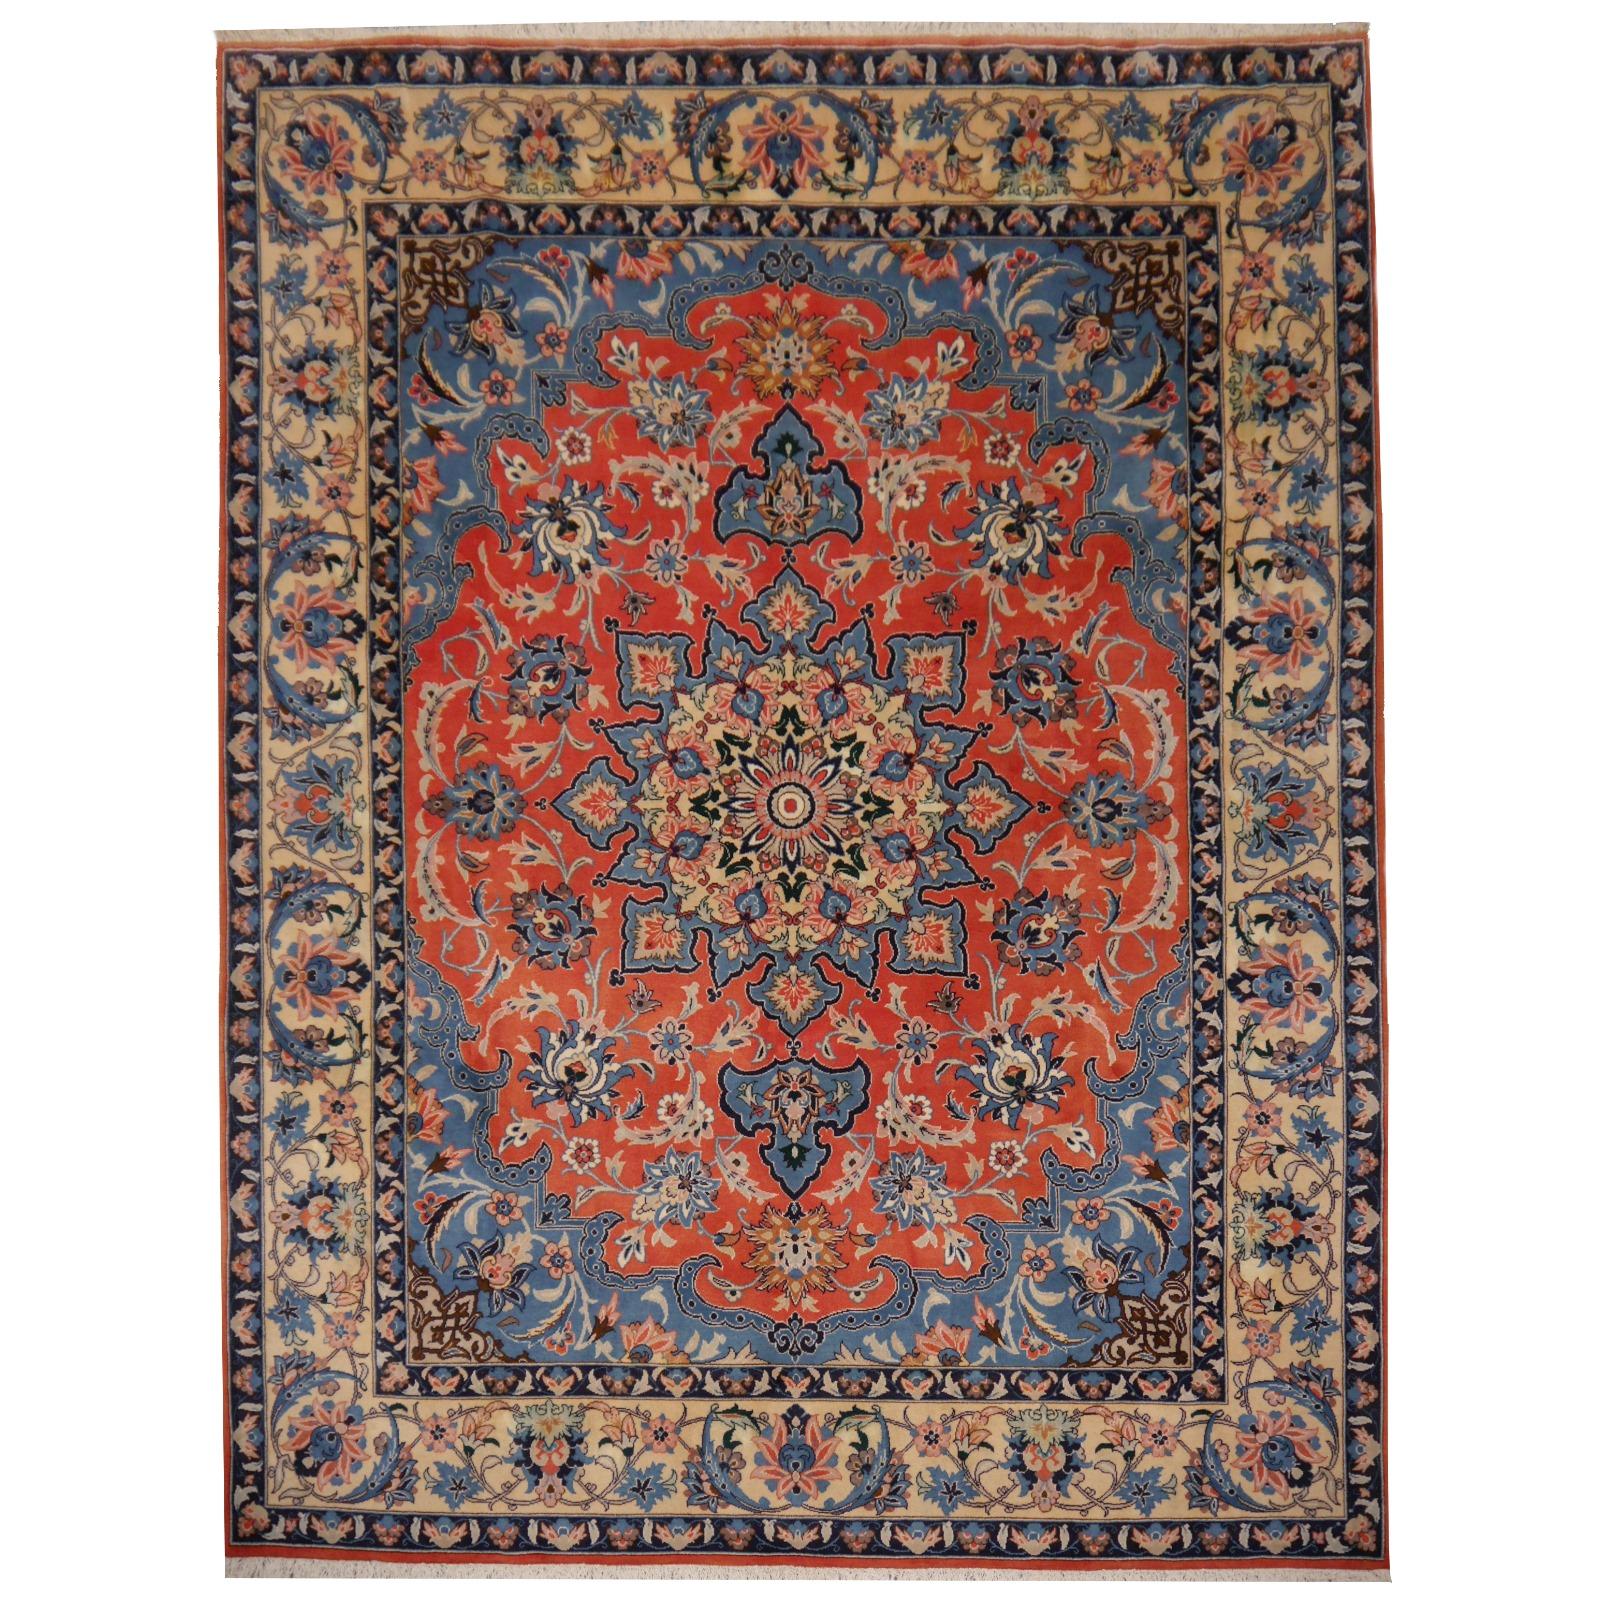 13566 yazd teppich iran persien 313 x 242 cm djoharian. Black Bedroom Furniture Sets. Home Design Ideas